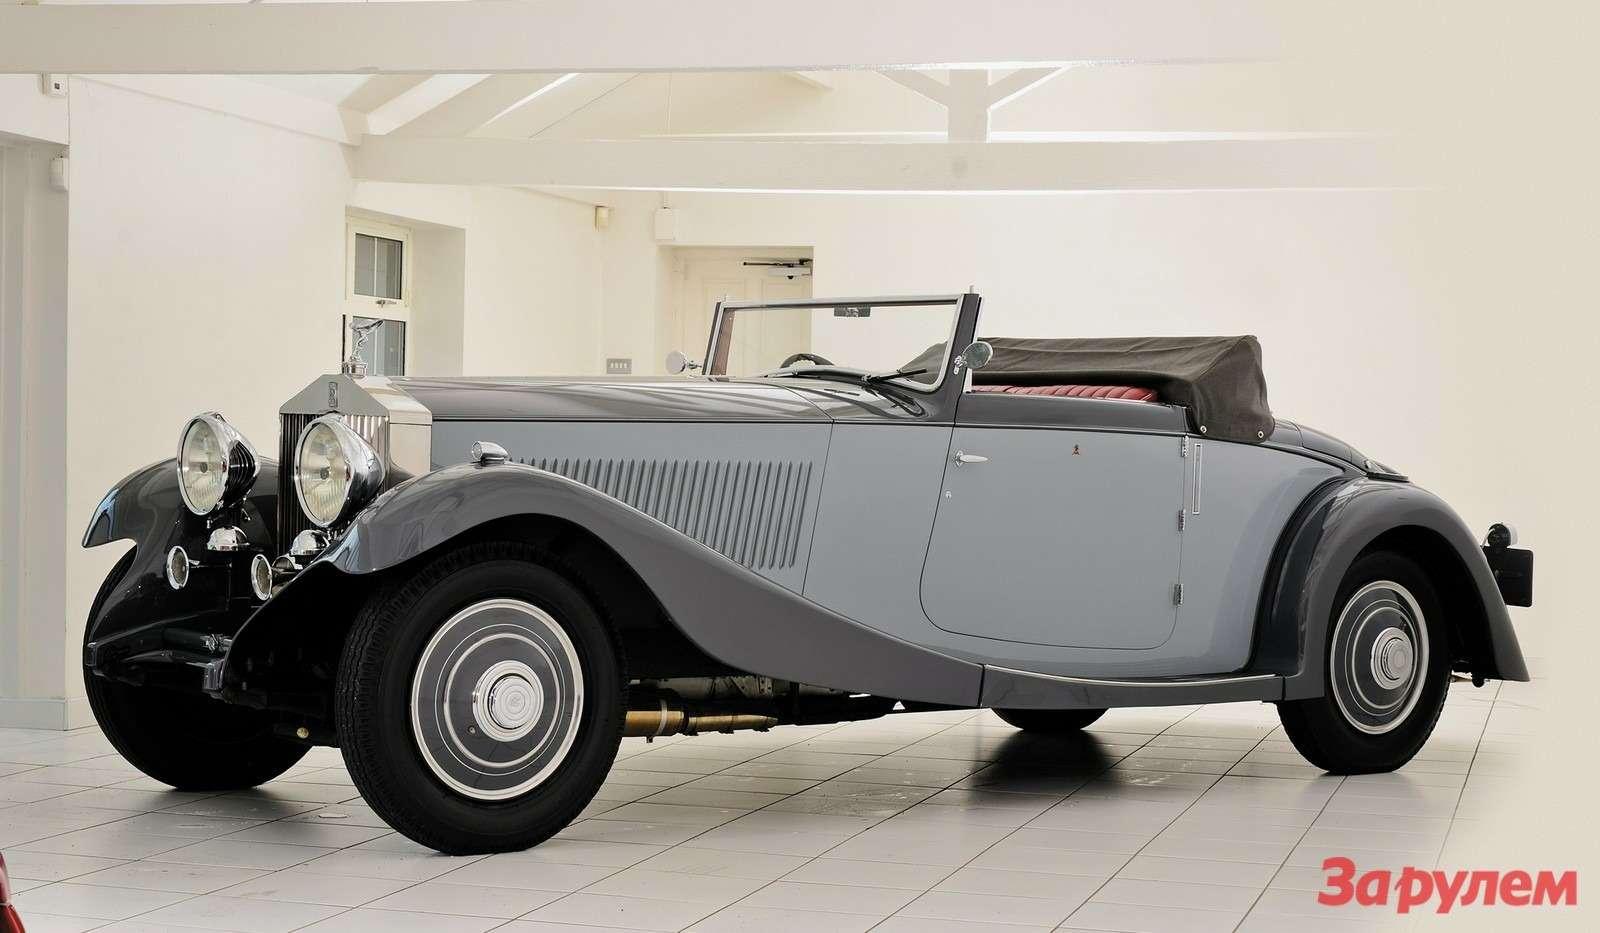 1932. Rolls-Royce Phantom IIContinental Drophead Coupé